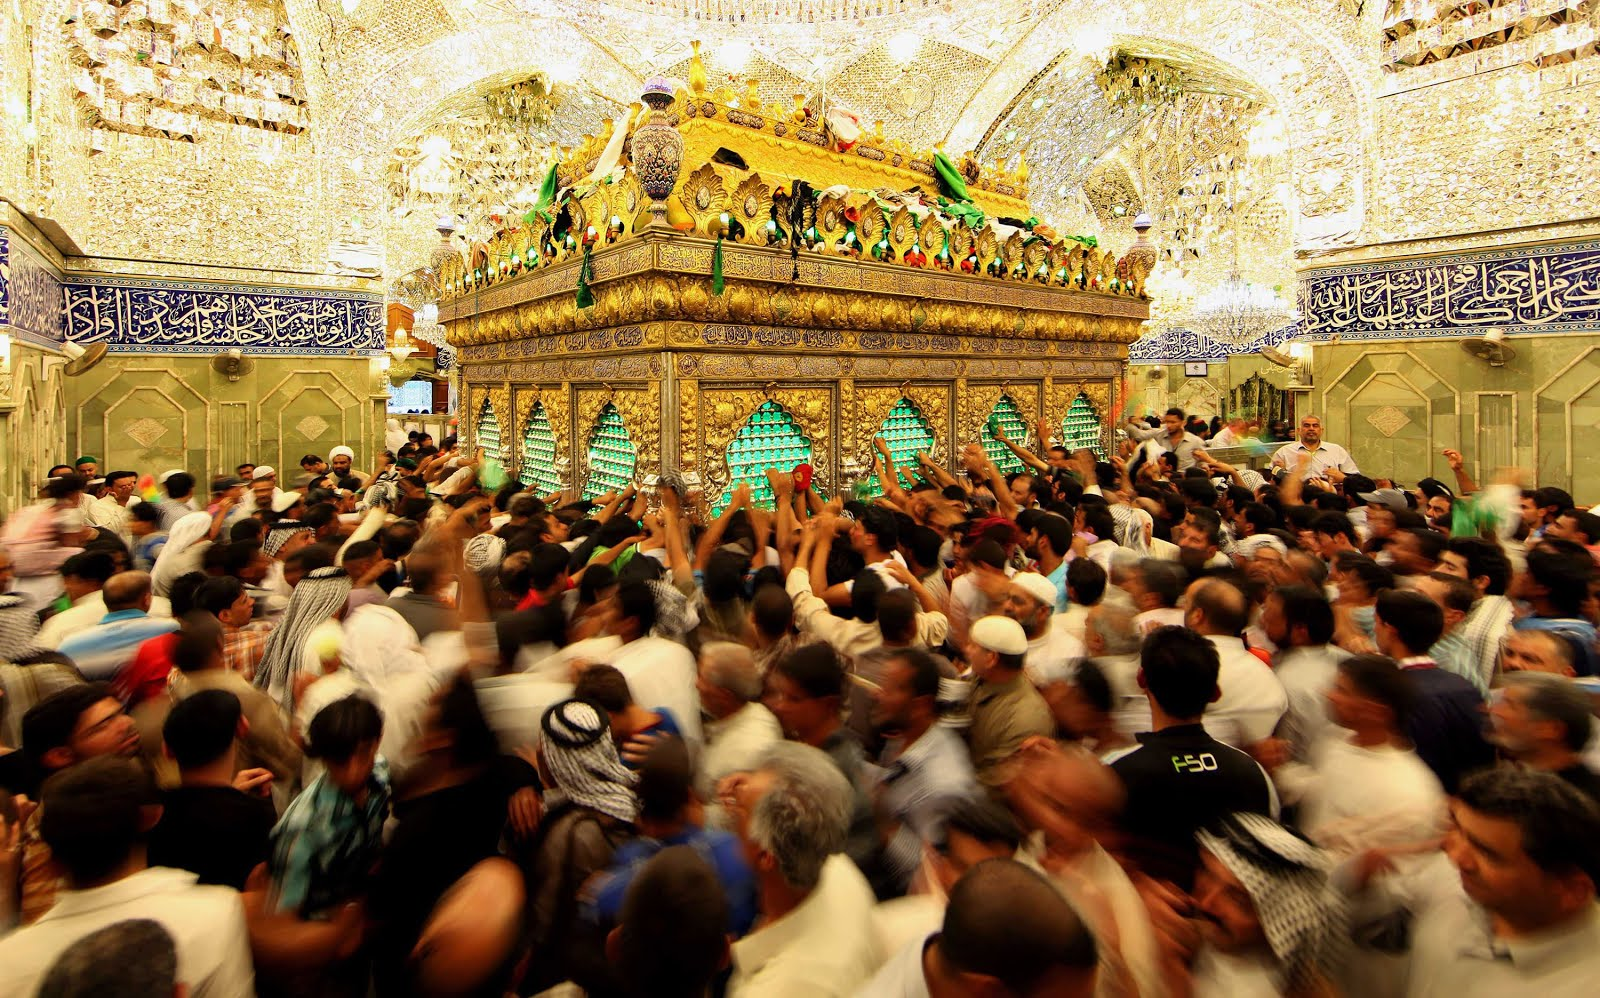 OLALEKAN ODUNTAN: Iraq Holidays and Festivals